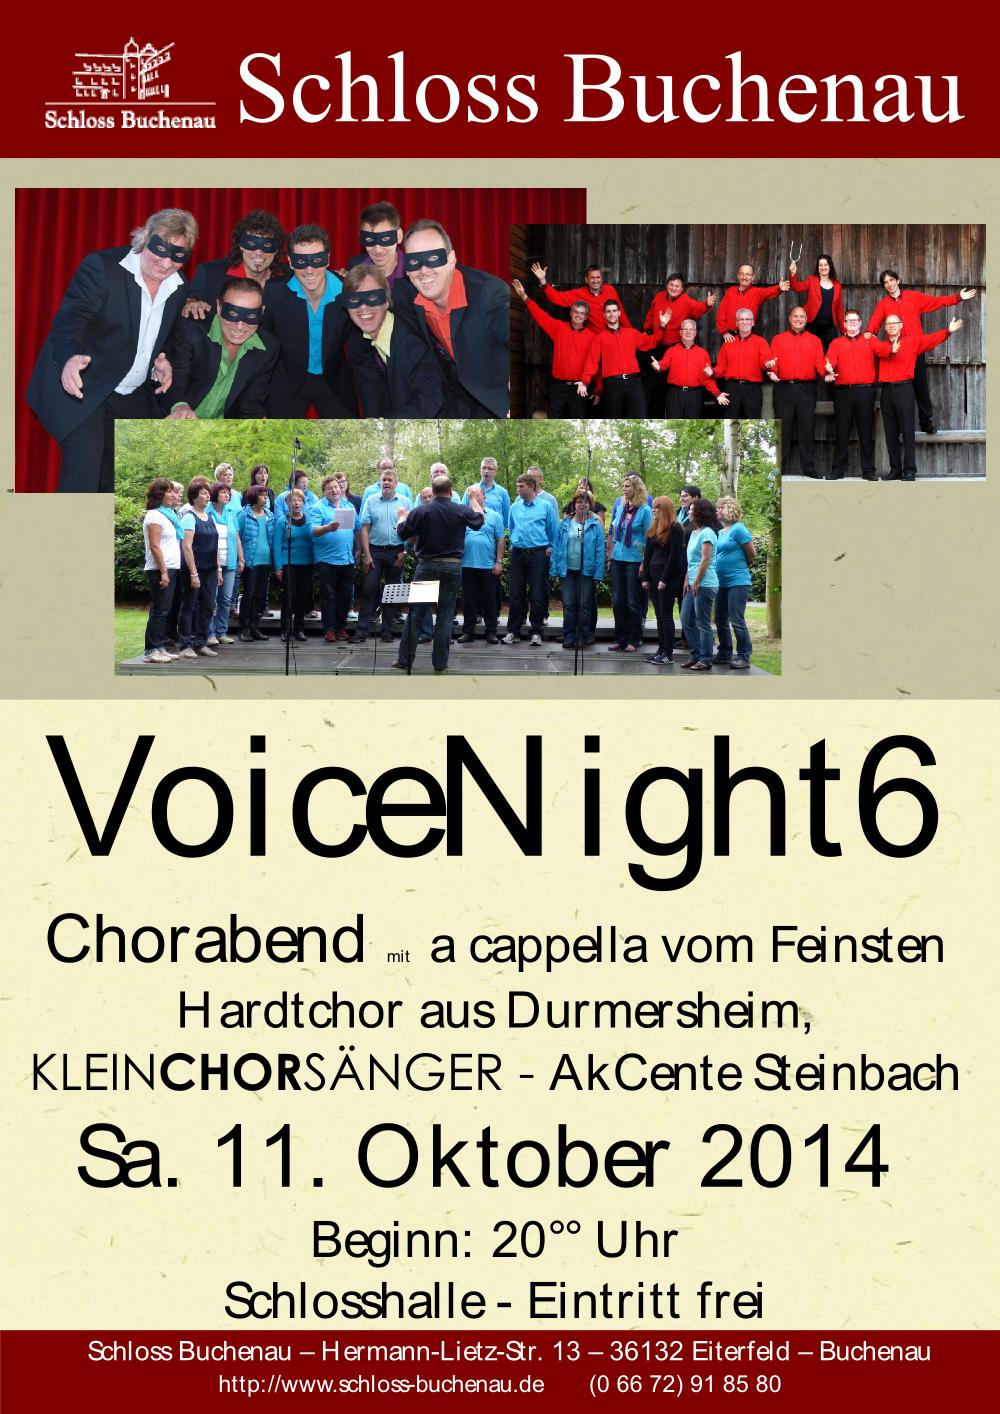 VoiceNight 2014